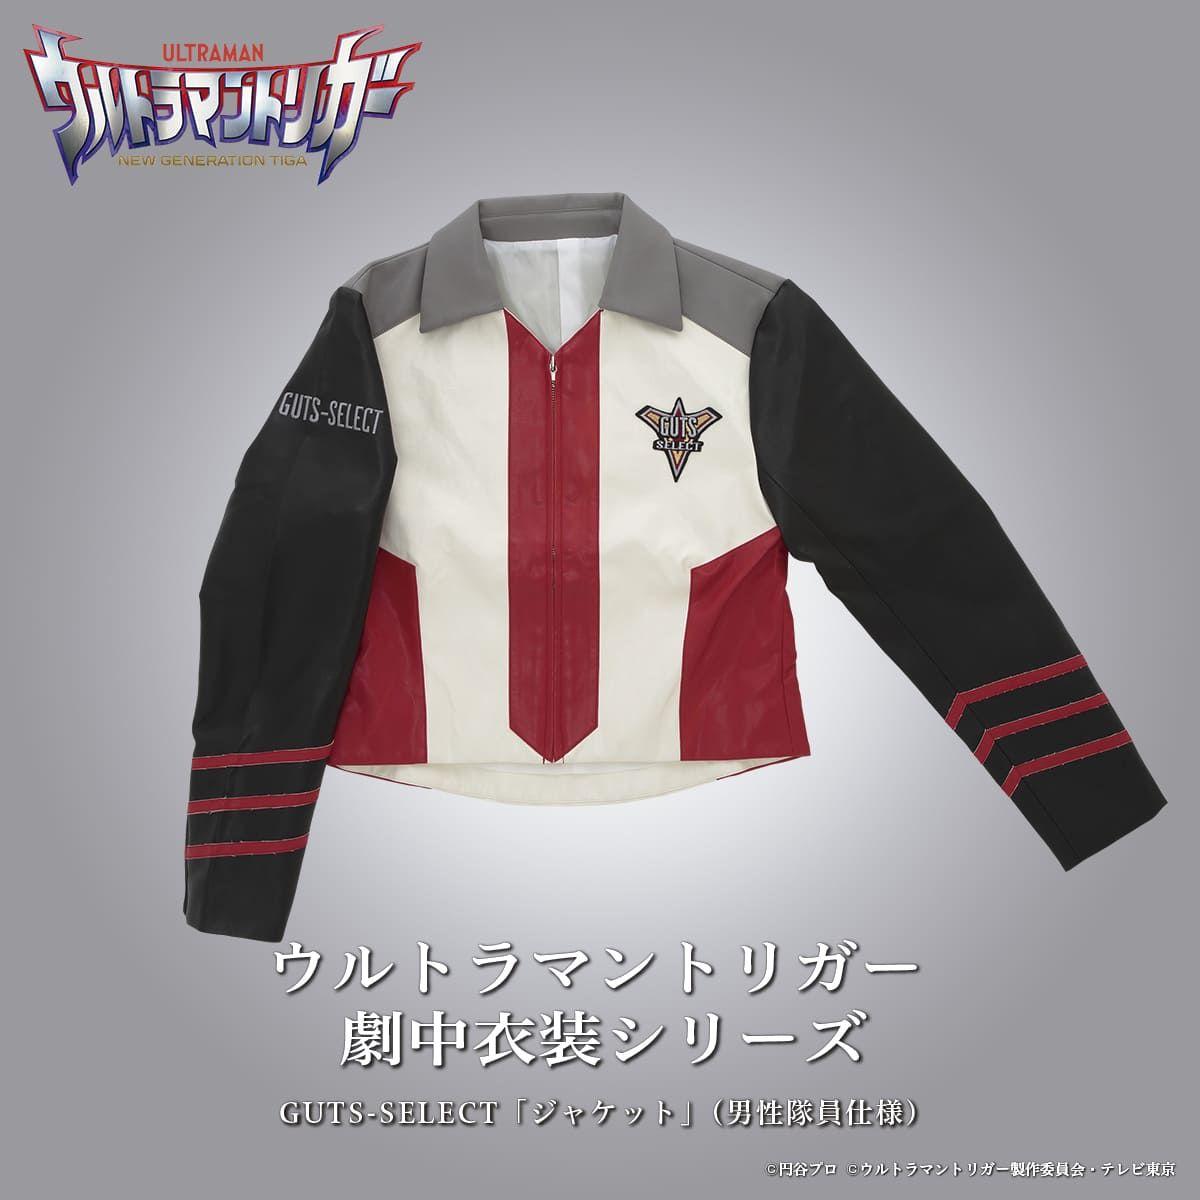 GUTS-Select Jacket—Ultraman Trigger: New Generation Tiga [Jan 2022 Delivery]